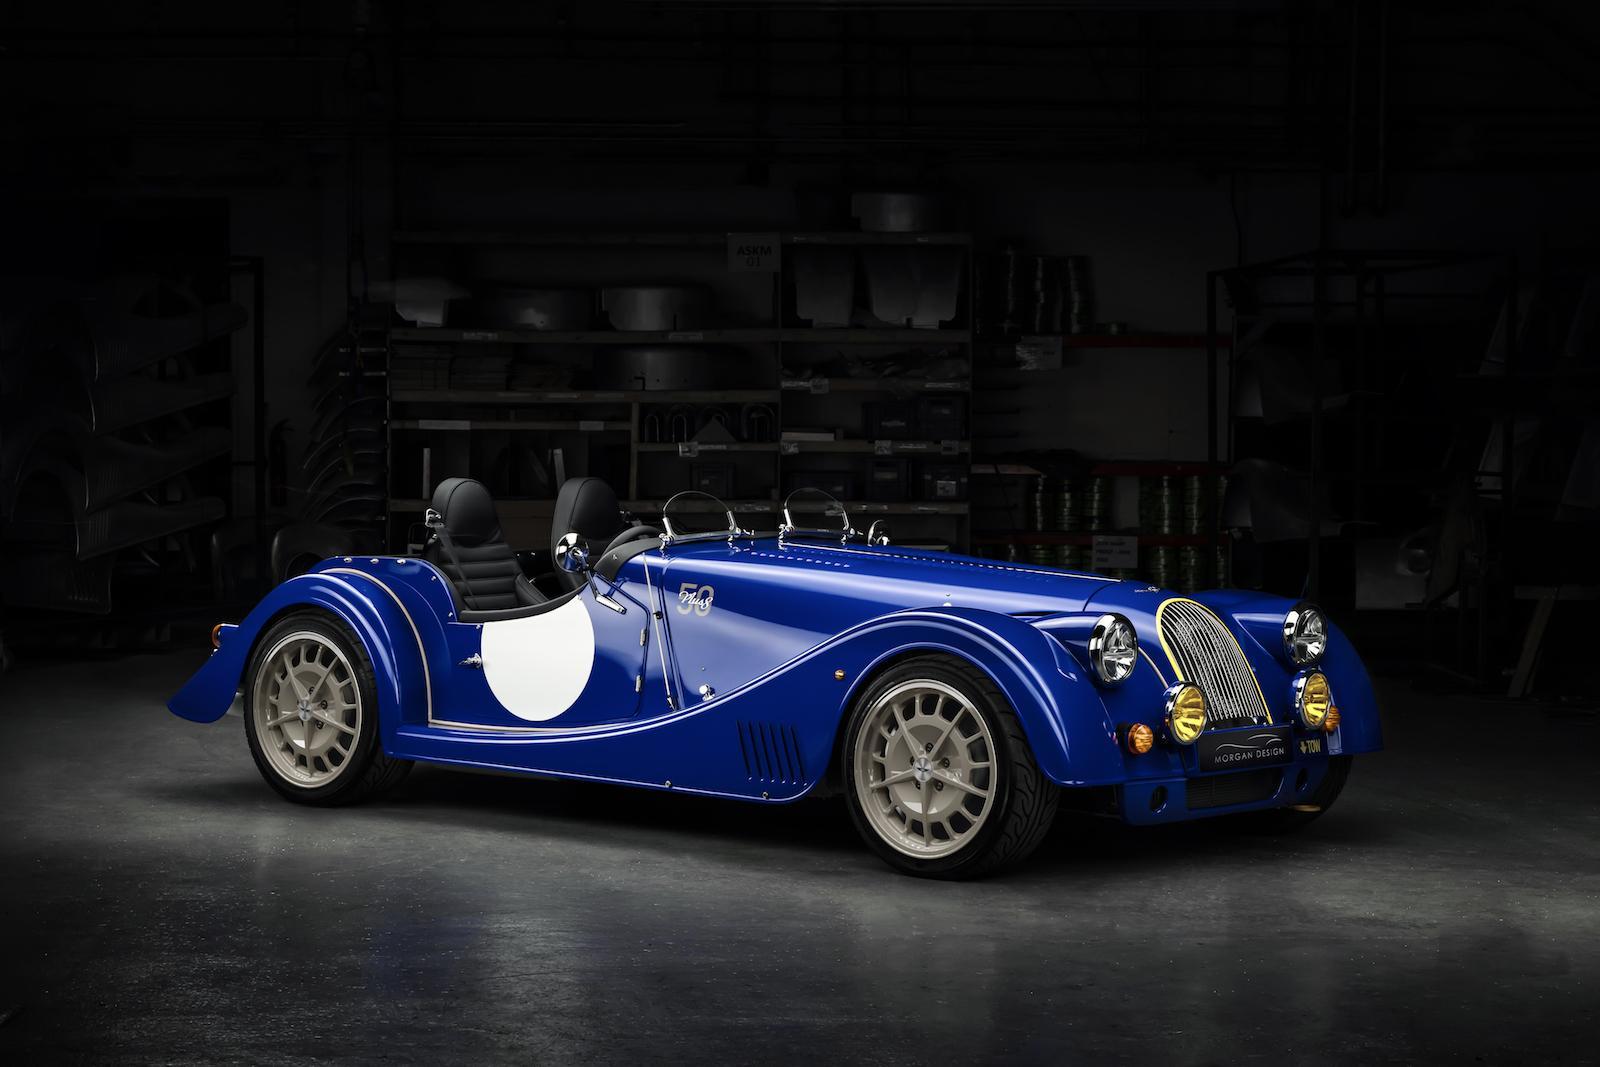 Morgan unveils two limited-run models at Geneva show